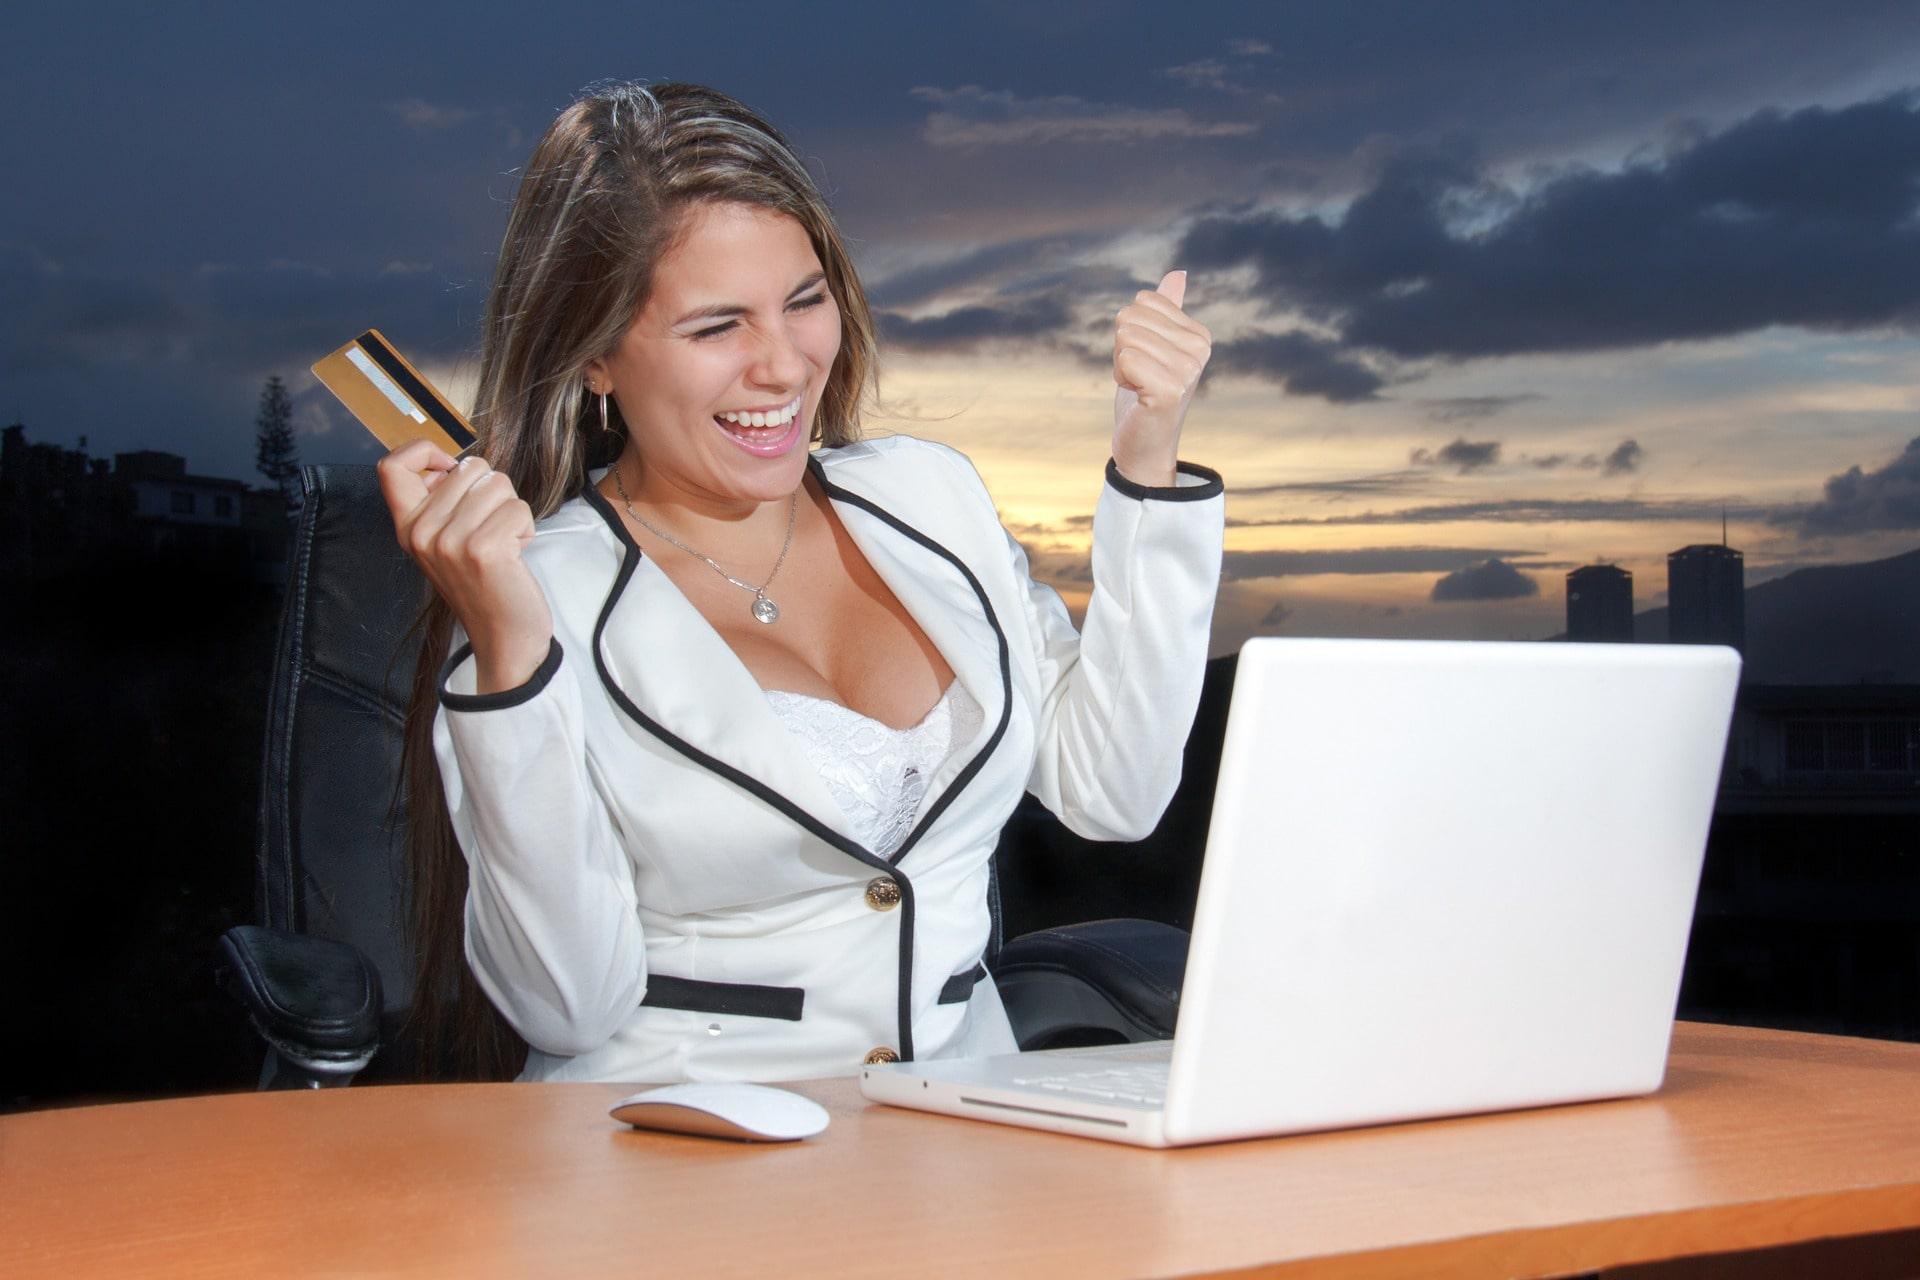 Buy Vehicle Insurance Online